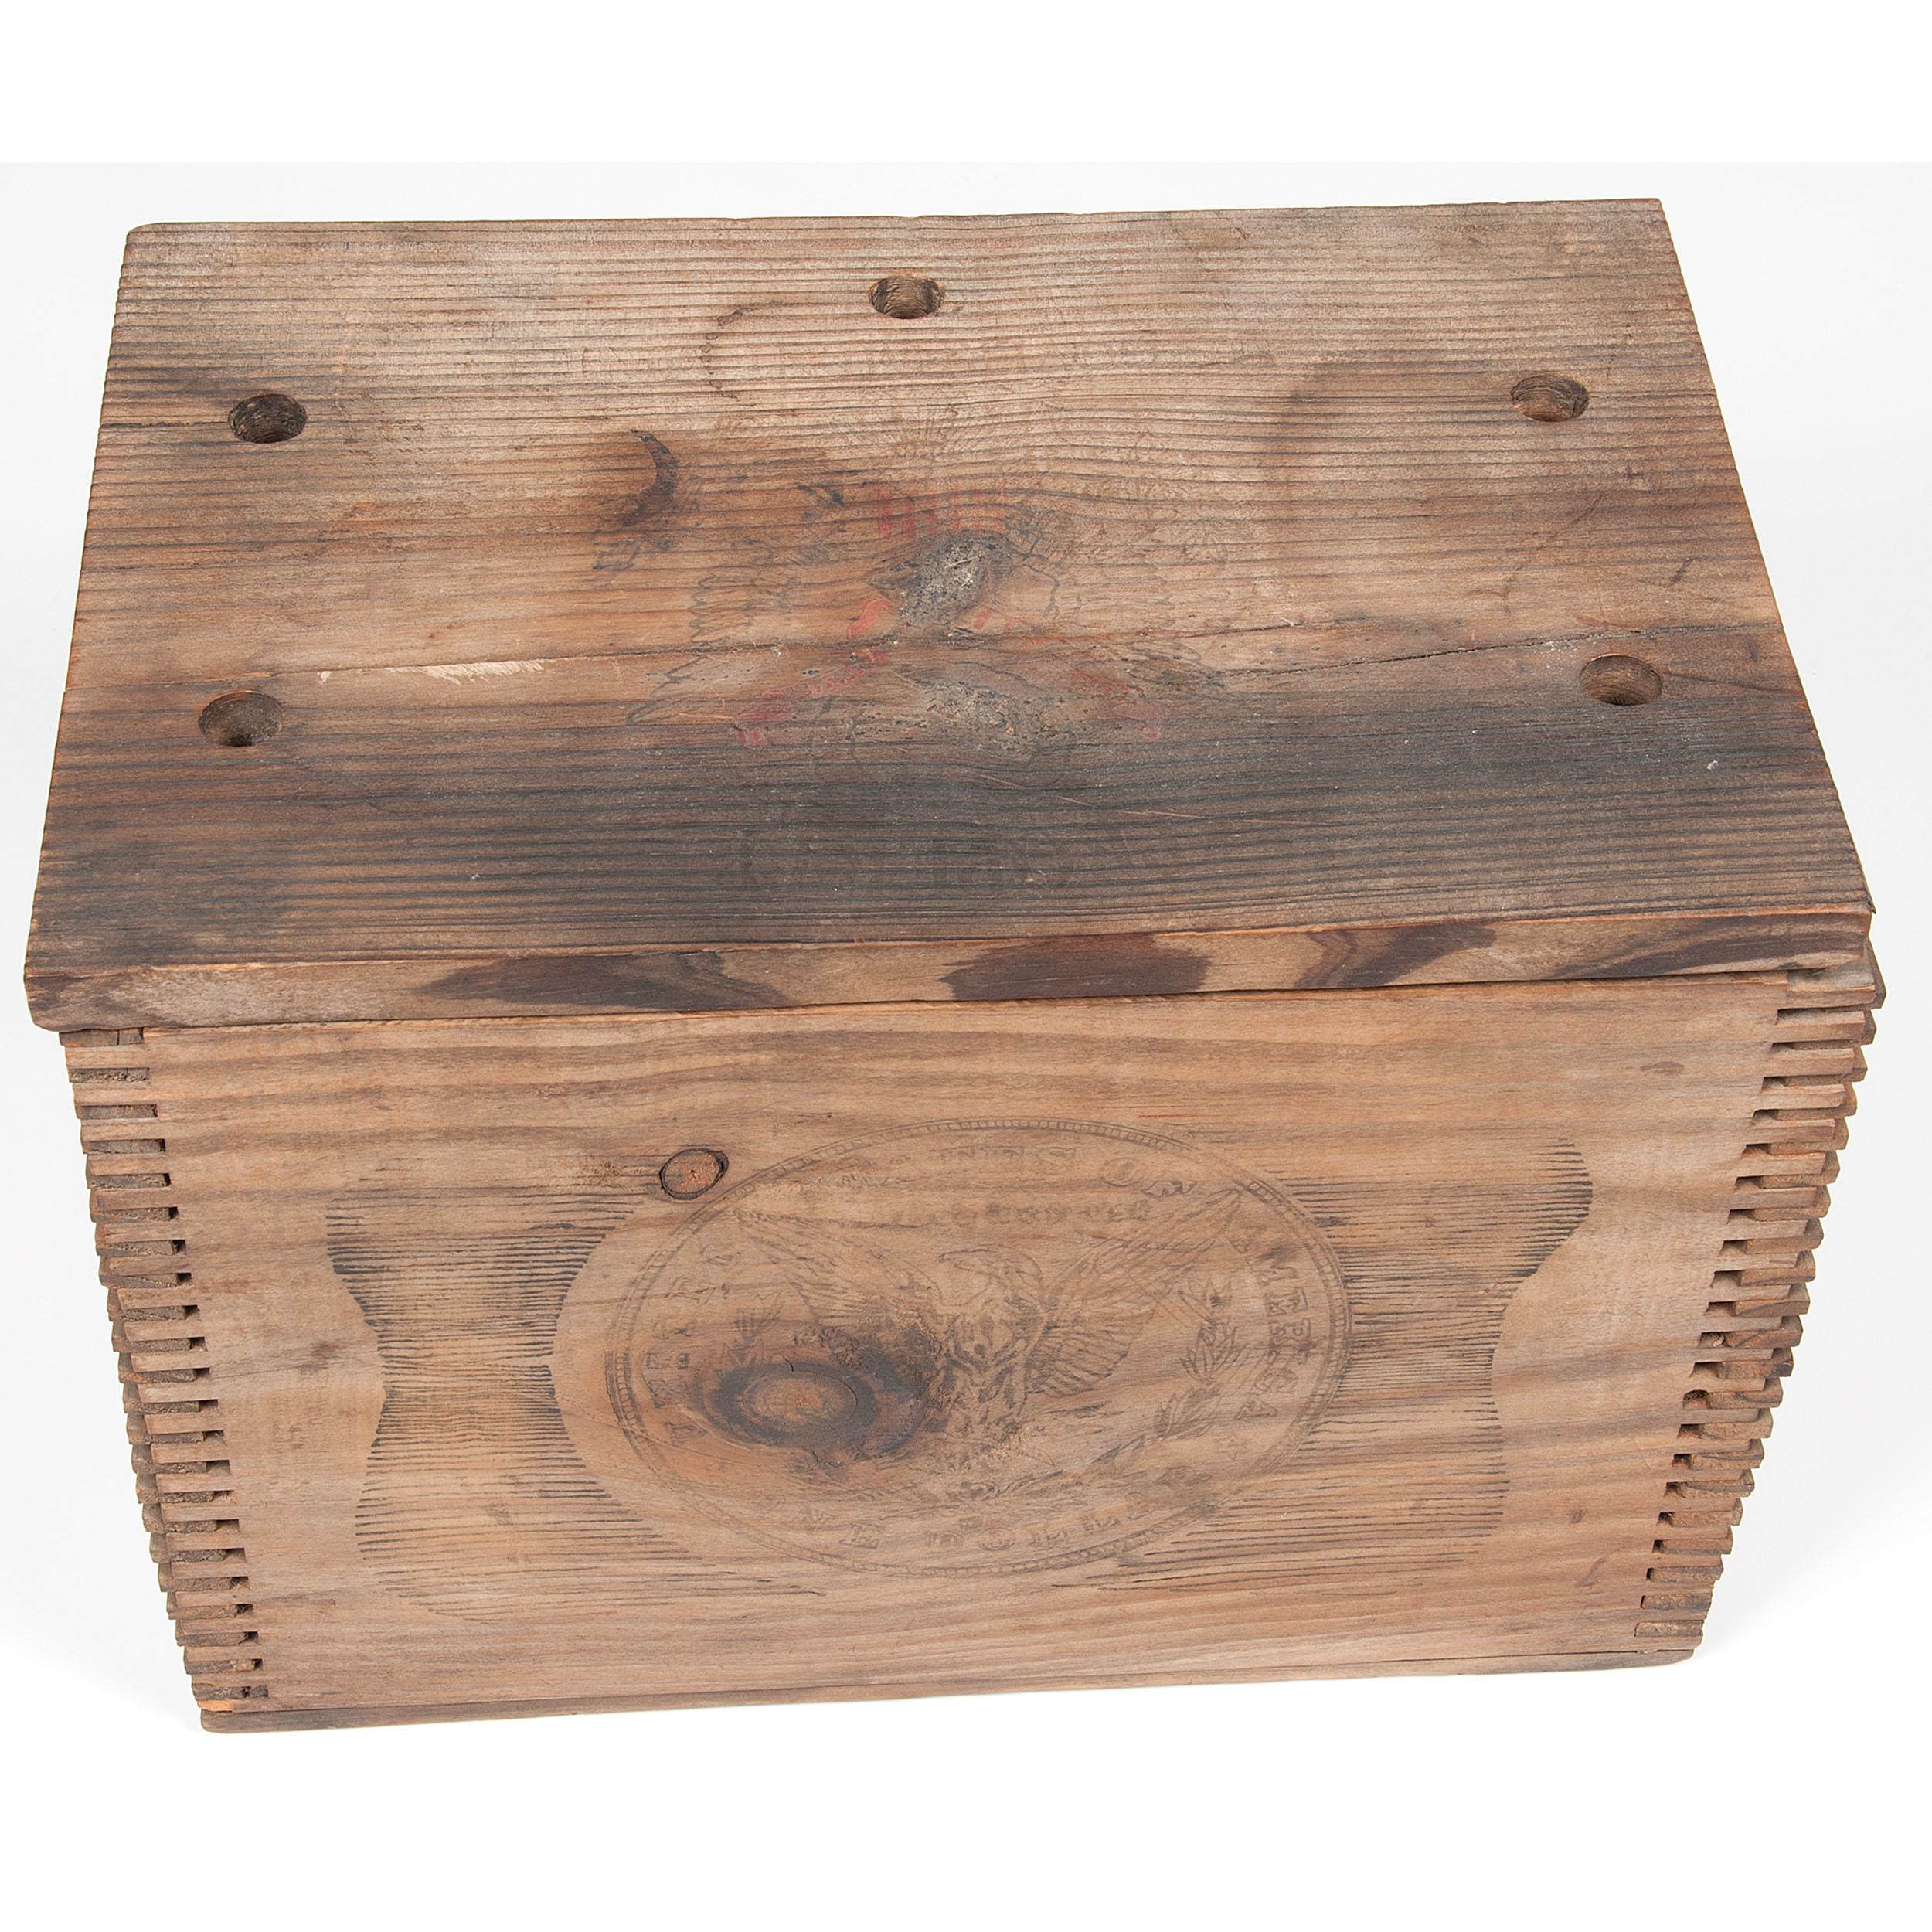 Us Mint At Carson City Nevada Wooden Box Ca Last Quarter 19th